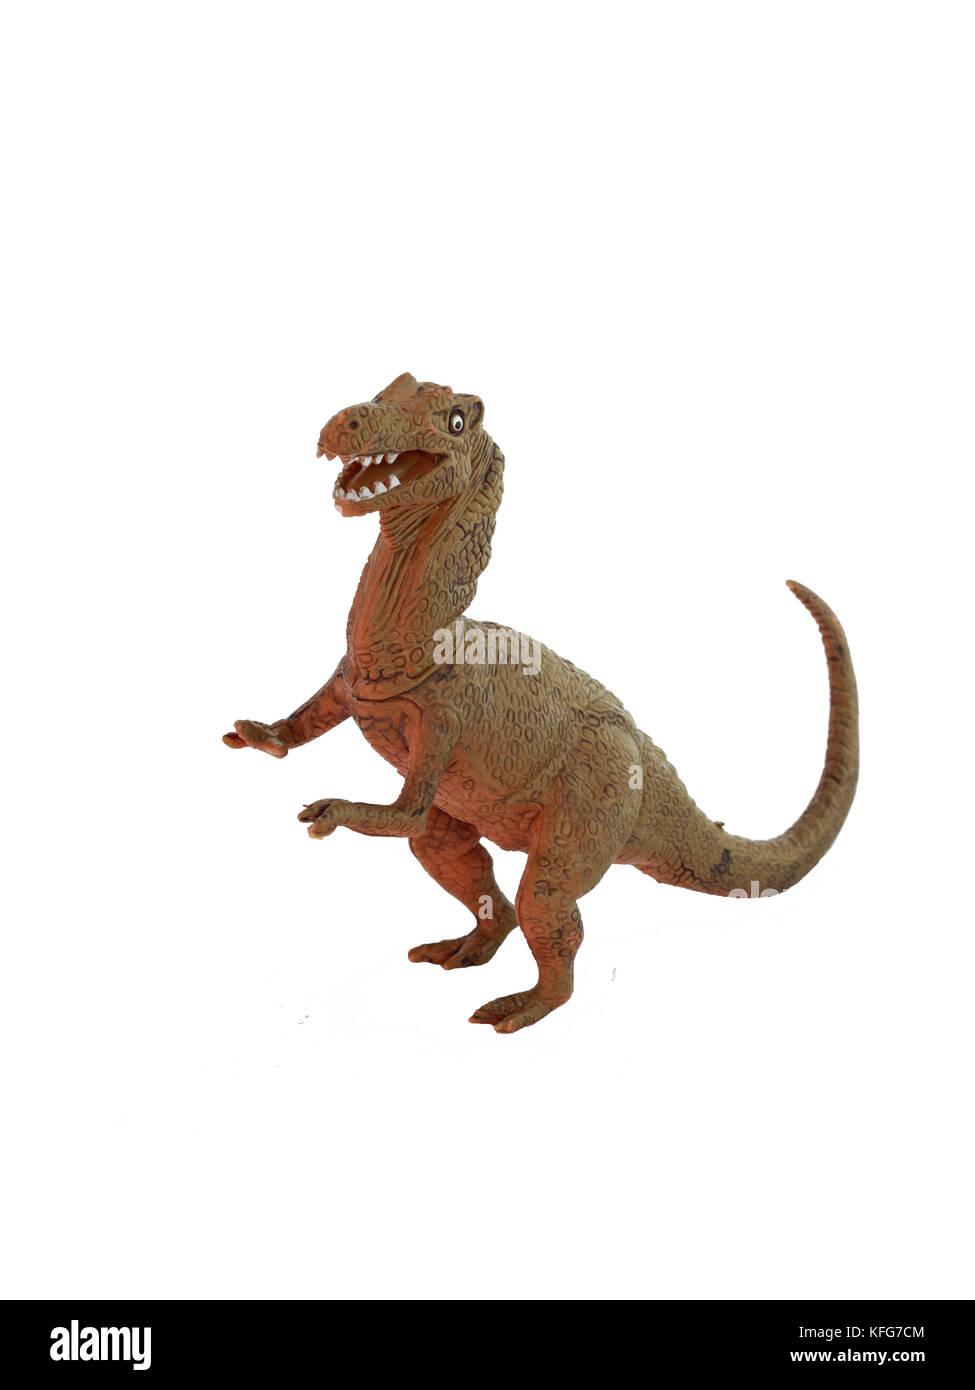 dinosaur on a white background - Stock Image